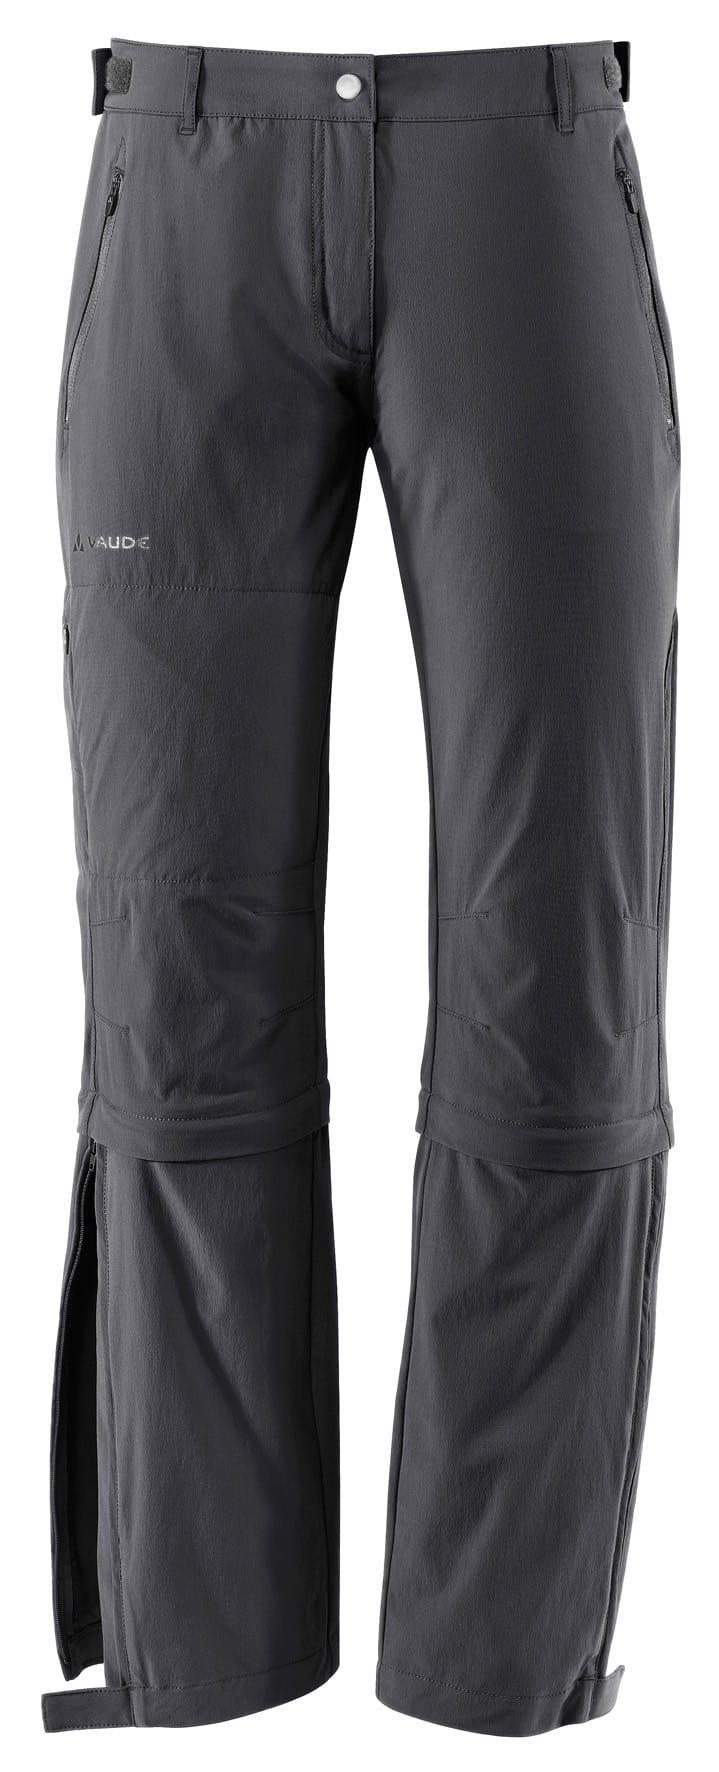 Vaude Womens Farley Stretch Capri T-Zip II | Größe 36,36 - Short,38 - Long,38,